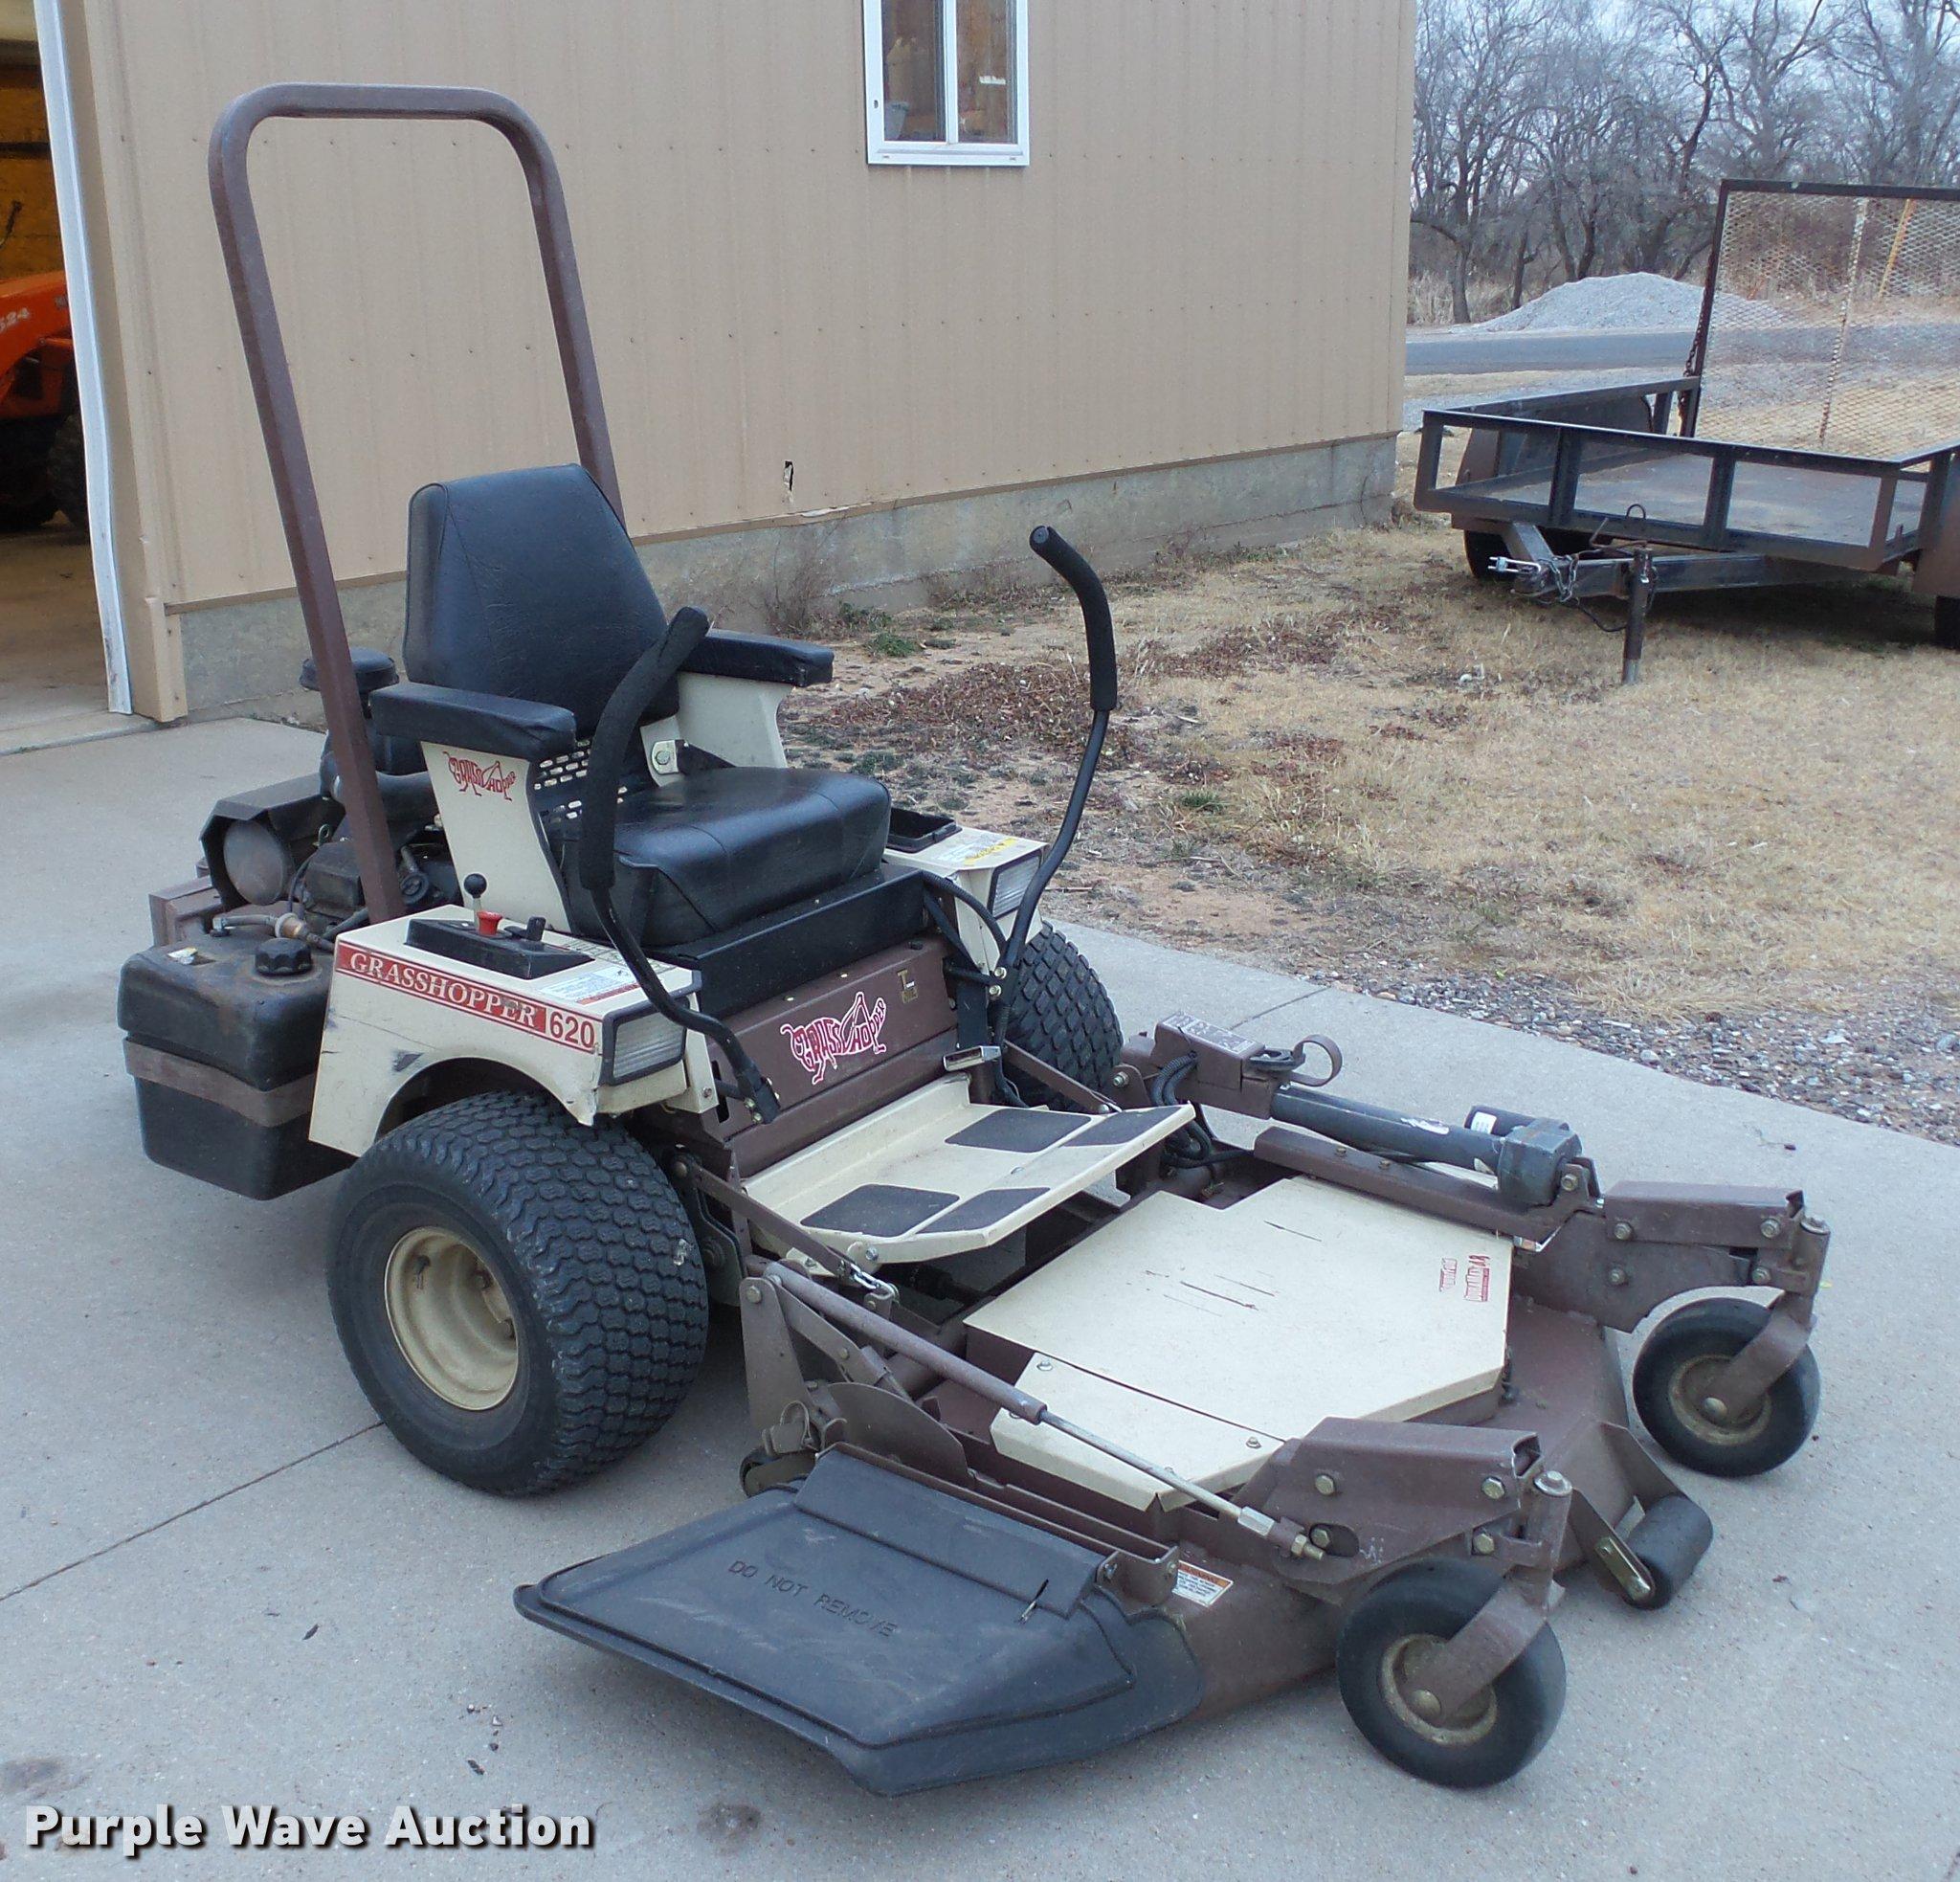 Grasshopper 620T lawn mower | Item DC5718 | SOLD! February 6